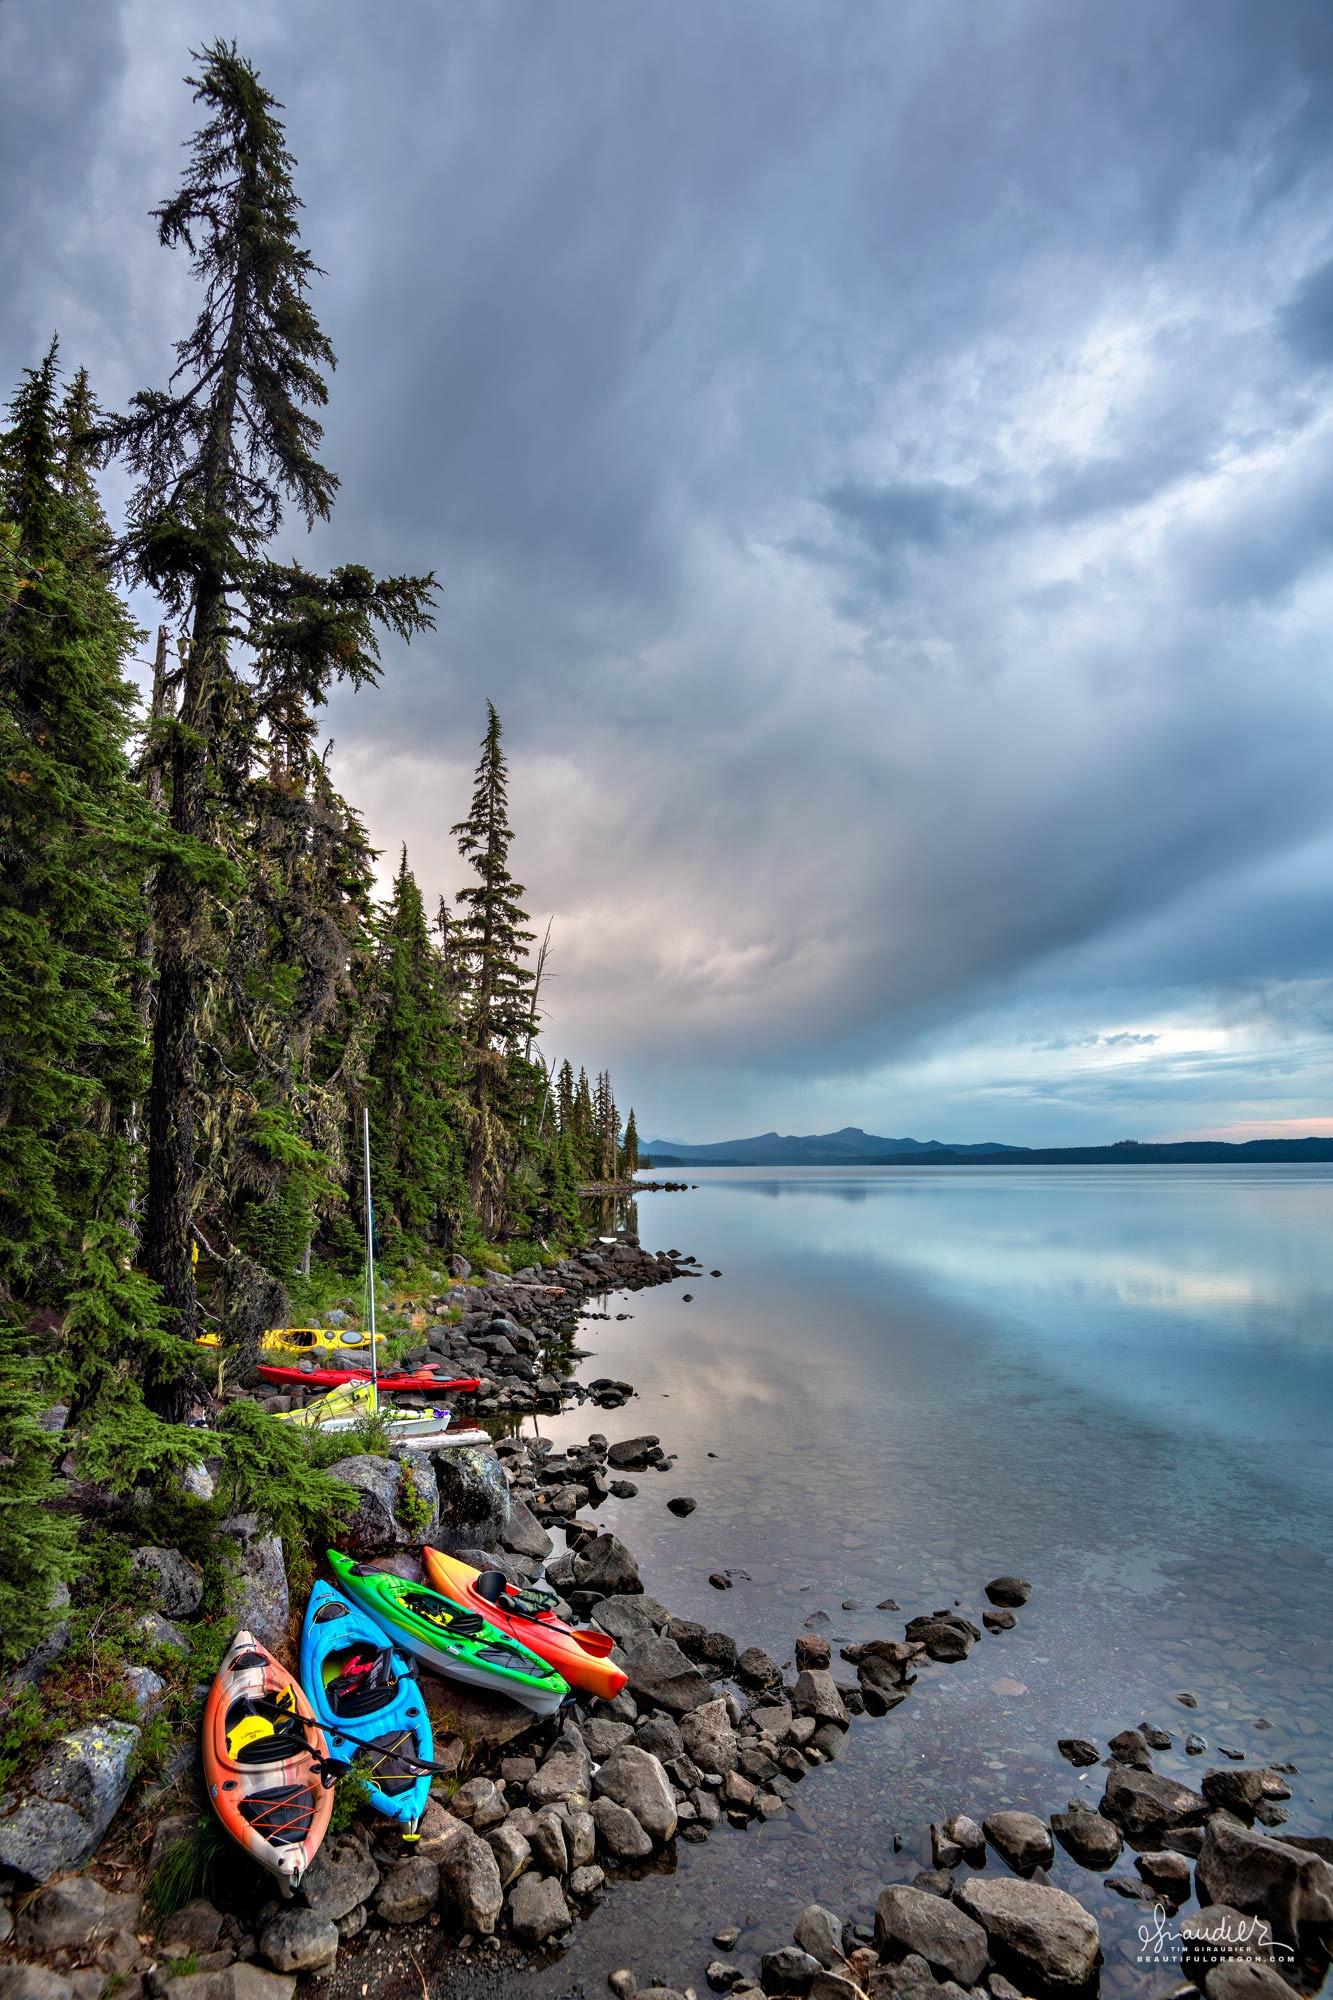 Kayaks at Waldo Lake. Willamette National Forest, Central Oregon Casacades